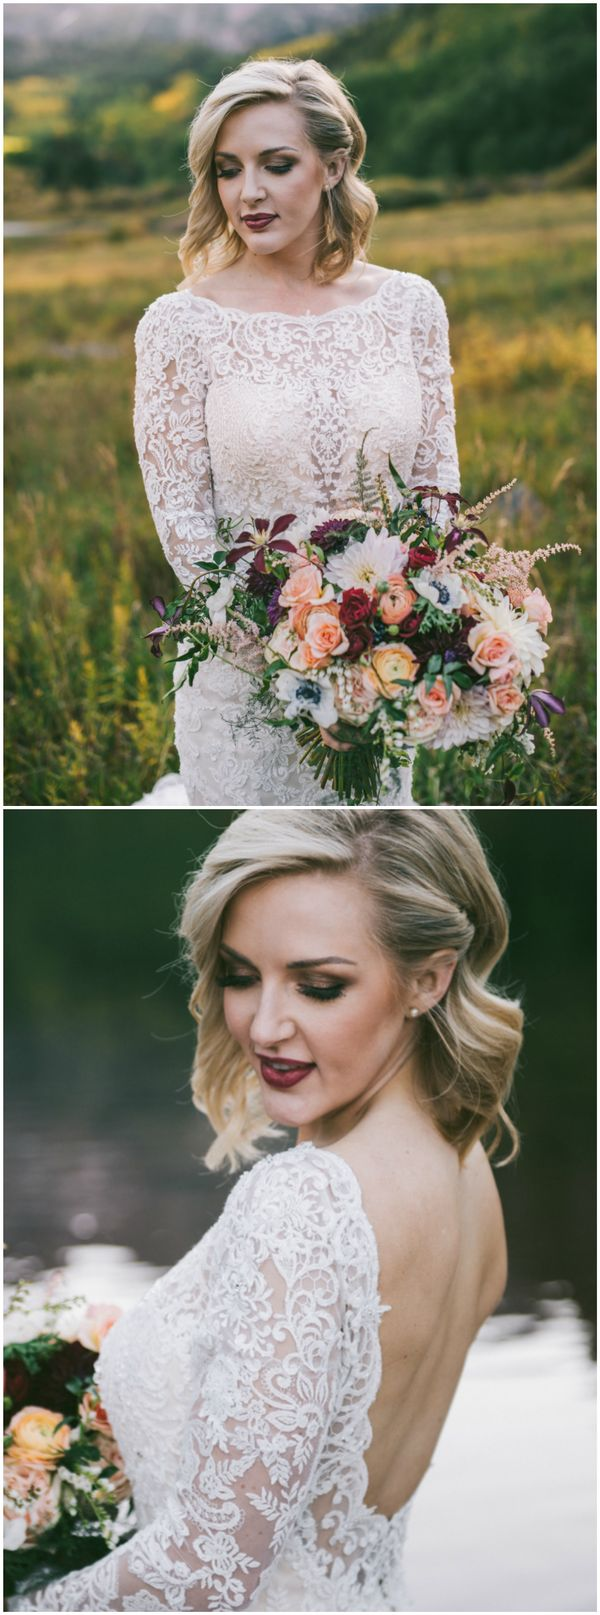 Wedding hairstyle, short bridal hair, curled locks, dark maroon lipstick, smokey eye, lace wedding dress, pin to your own inspiration board // Blue Elephant Photography